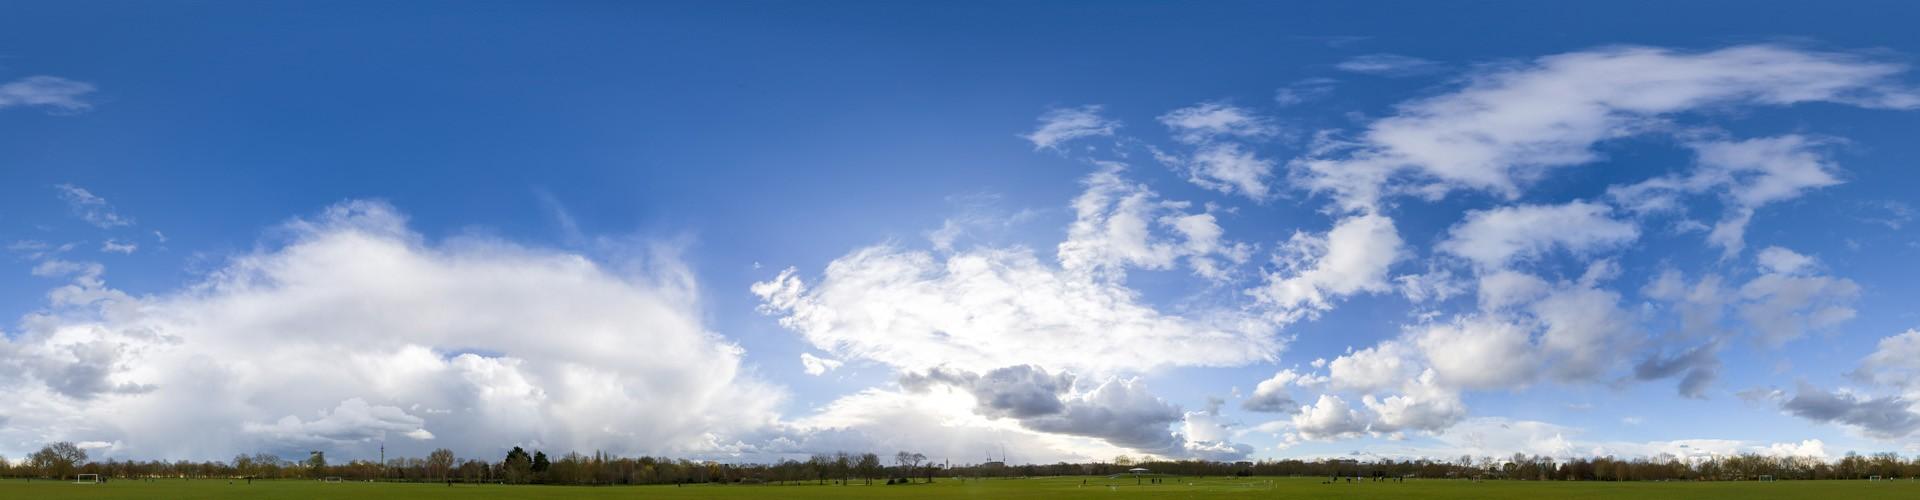 Rainy Clouds 2777 (30k) HDRI